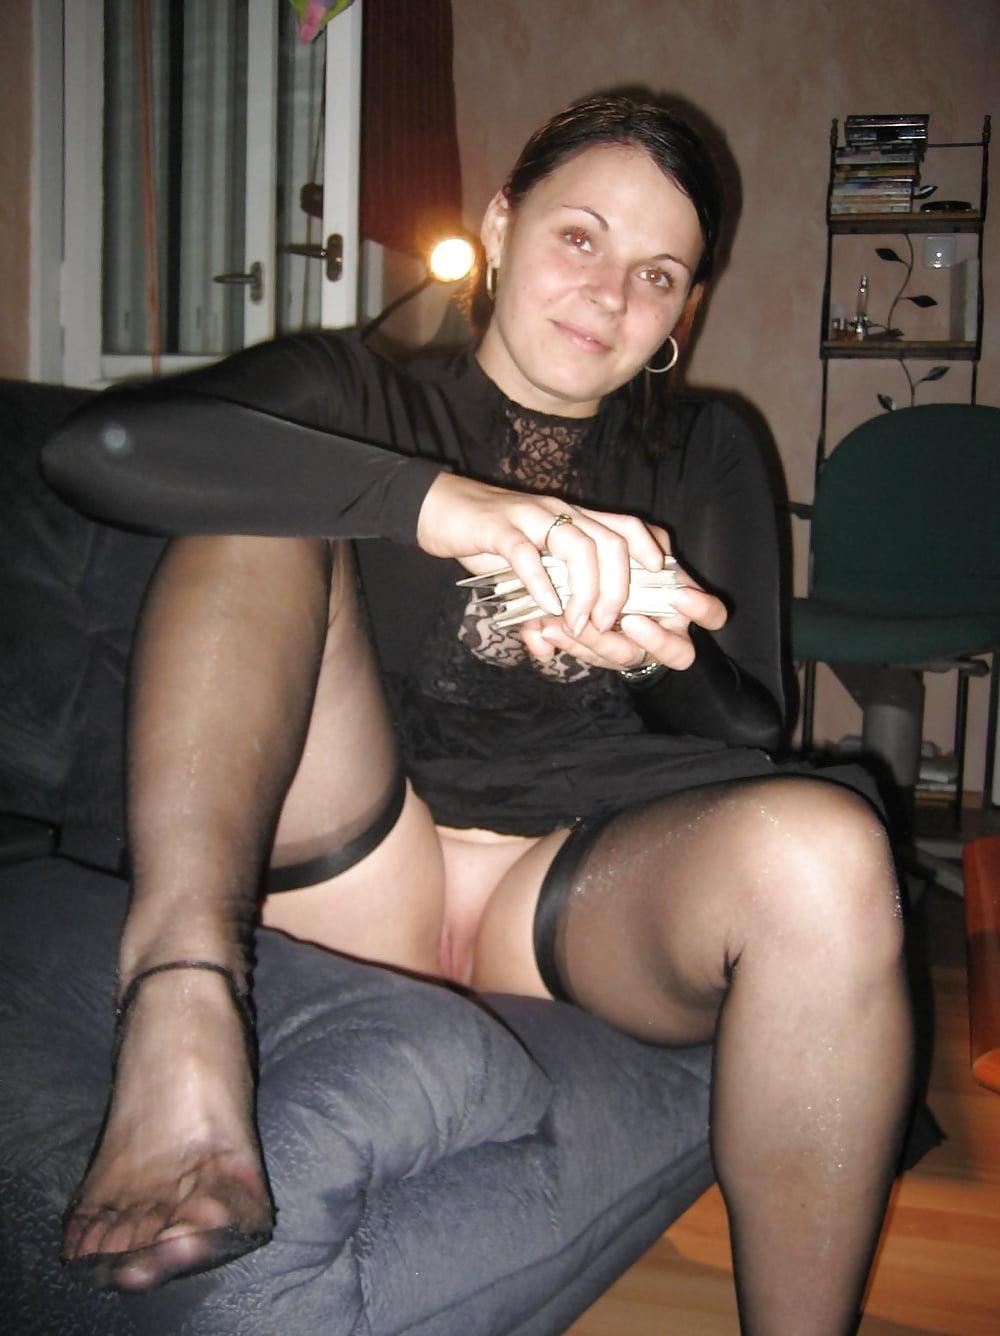 Pics stocking amateur Women in